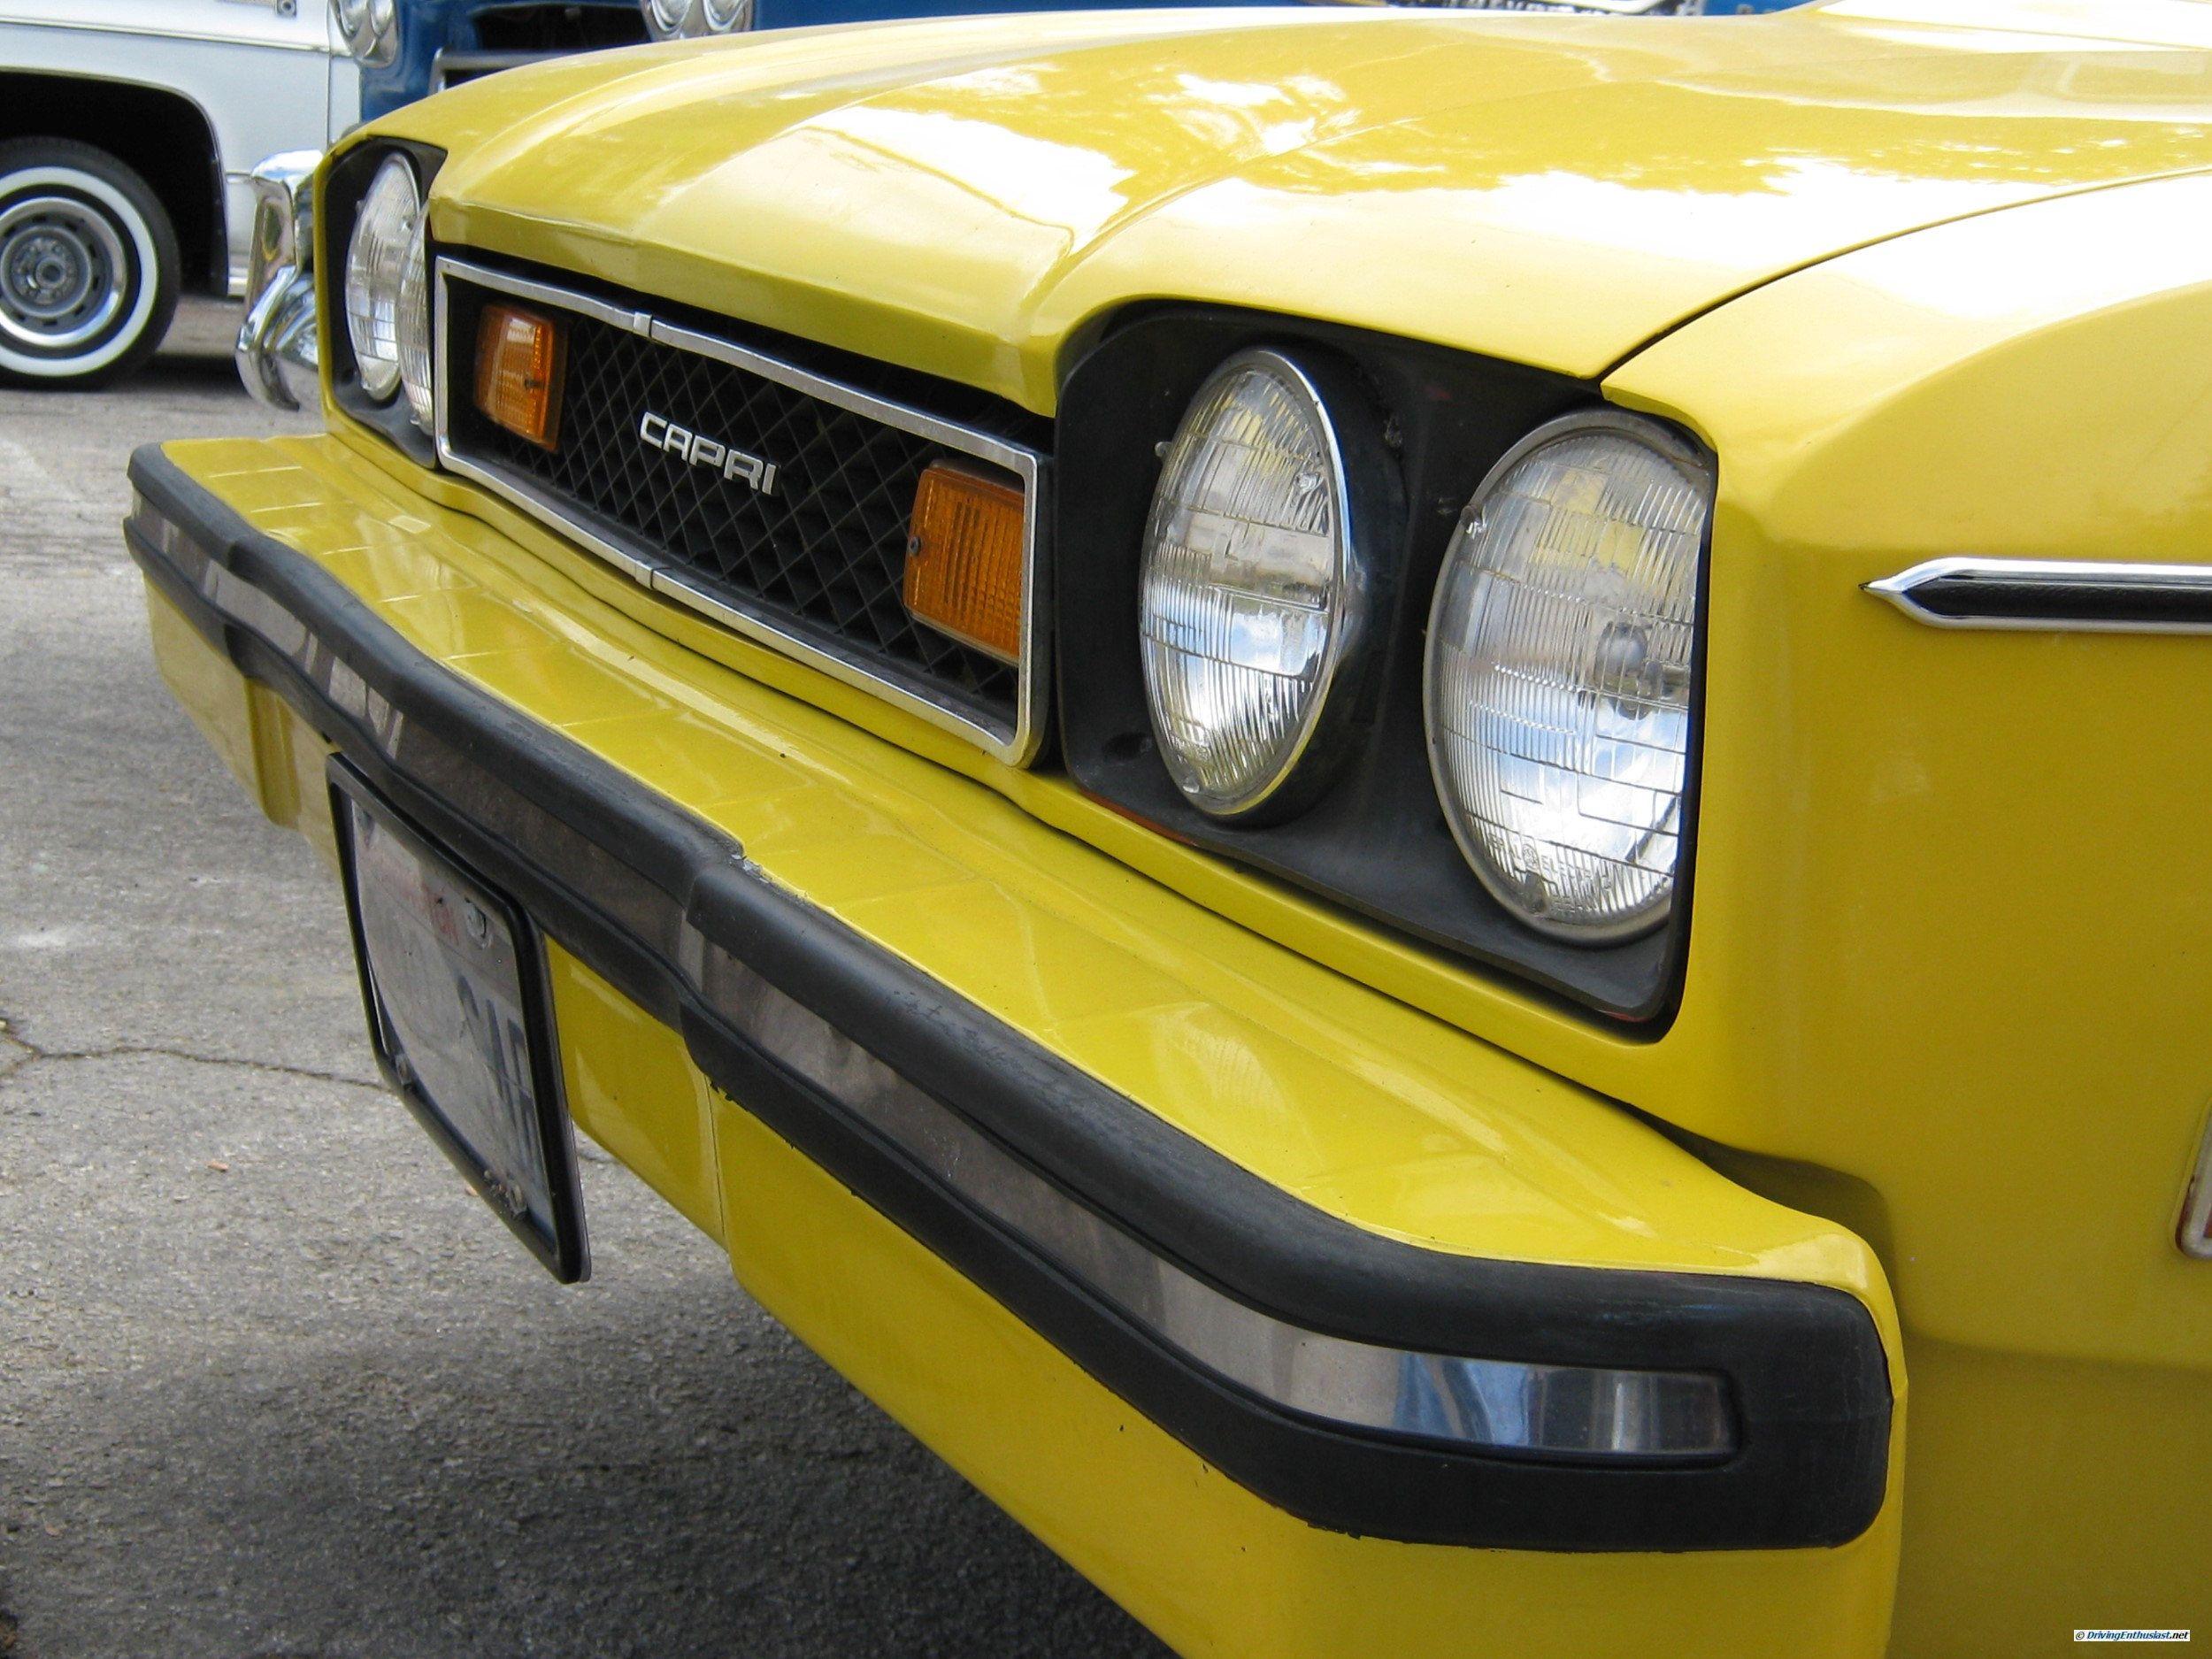 1976 Mercury Capri. Slight restoration, for sale at $4900 in Sept ...